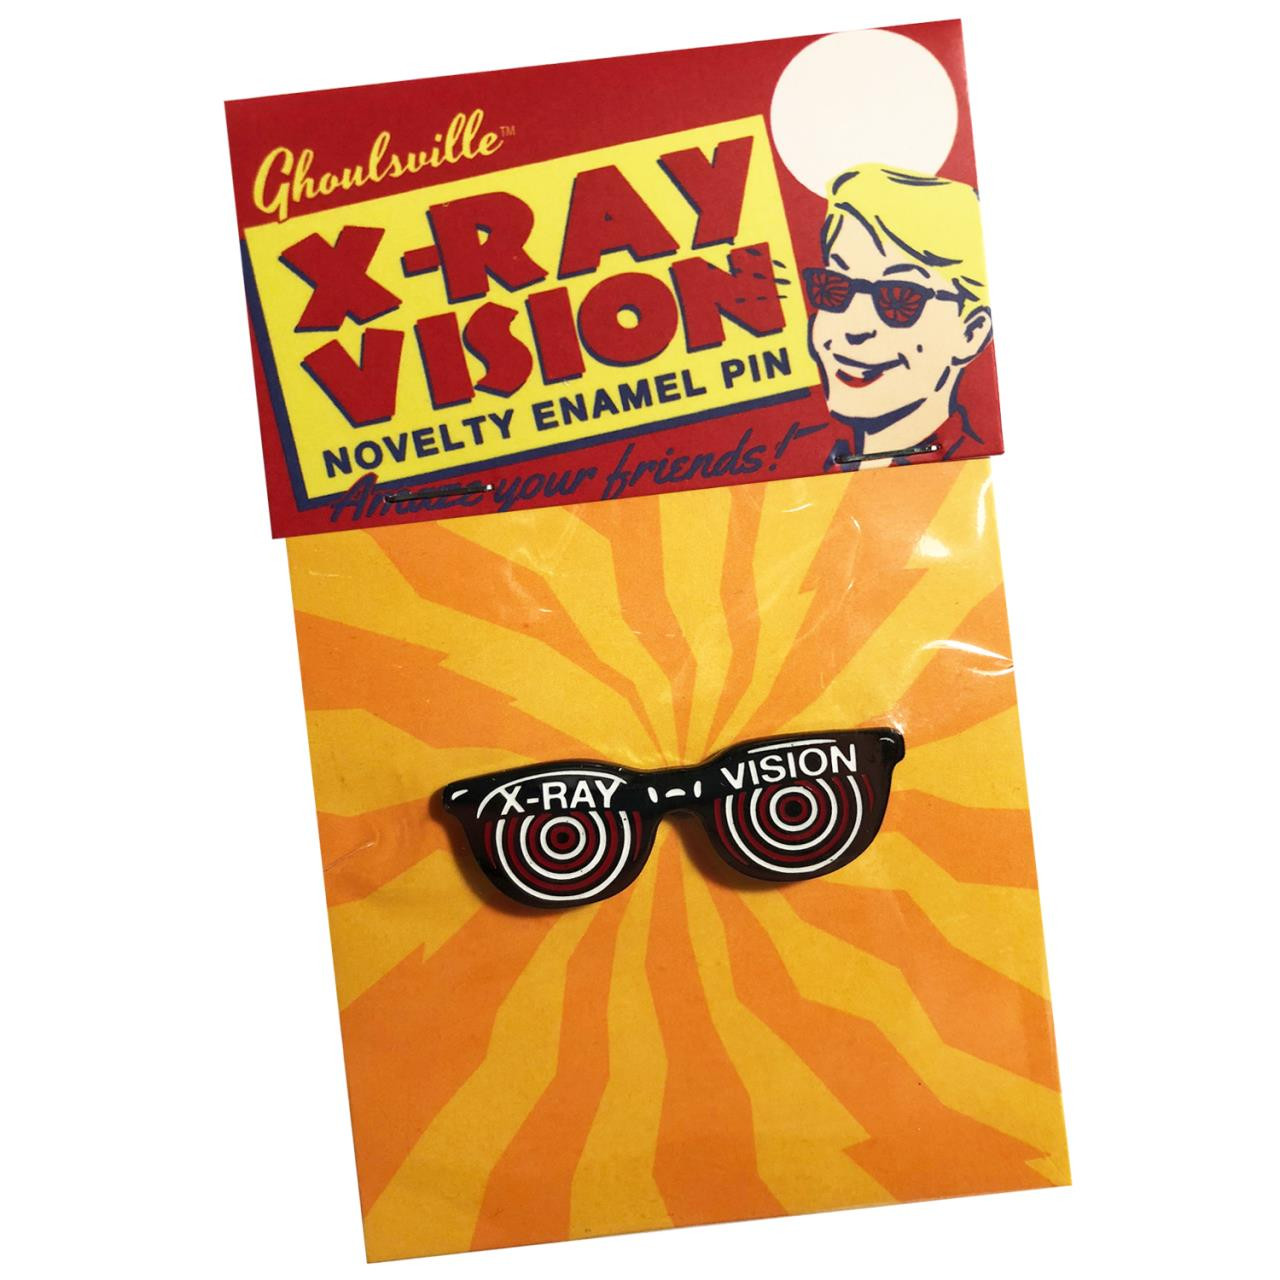 X-ray Enamel Pin* - 0659682806426